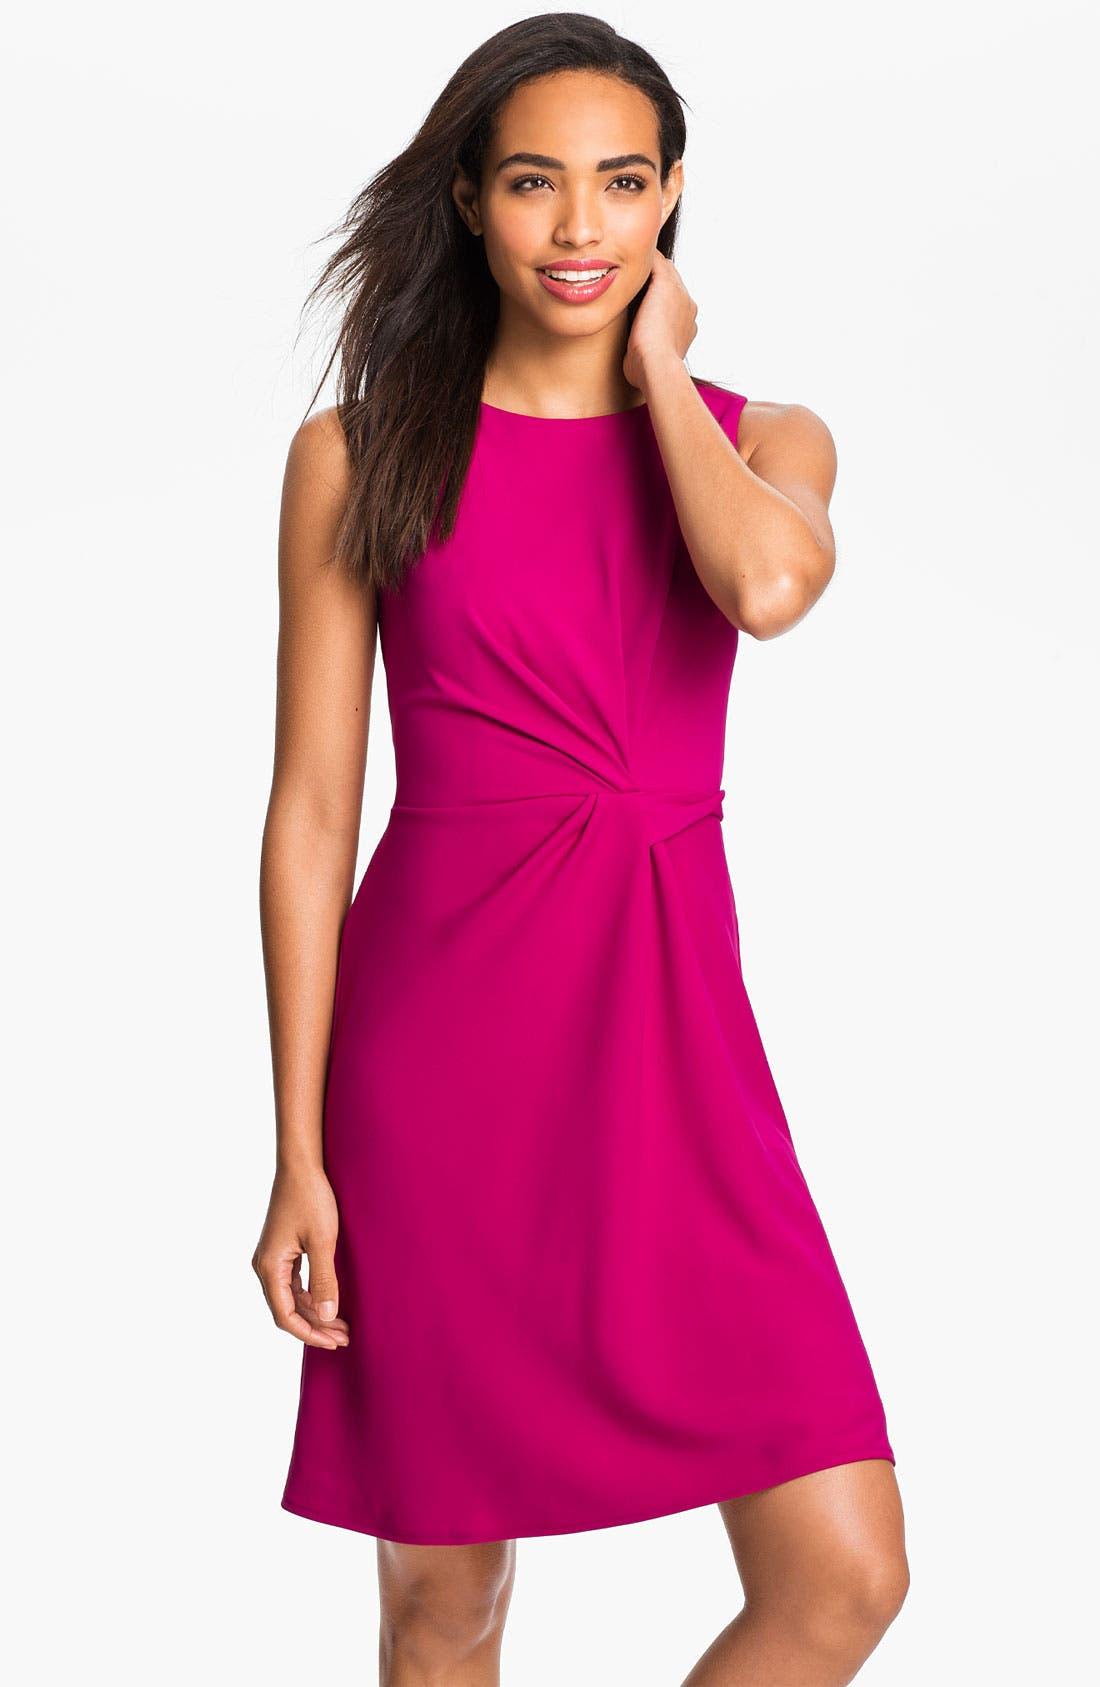 Alternate Image 1 Selected - Donna Ricco Sleeveless Side Tie Dress